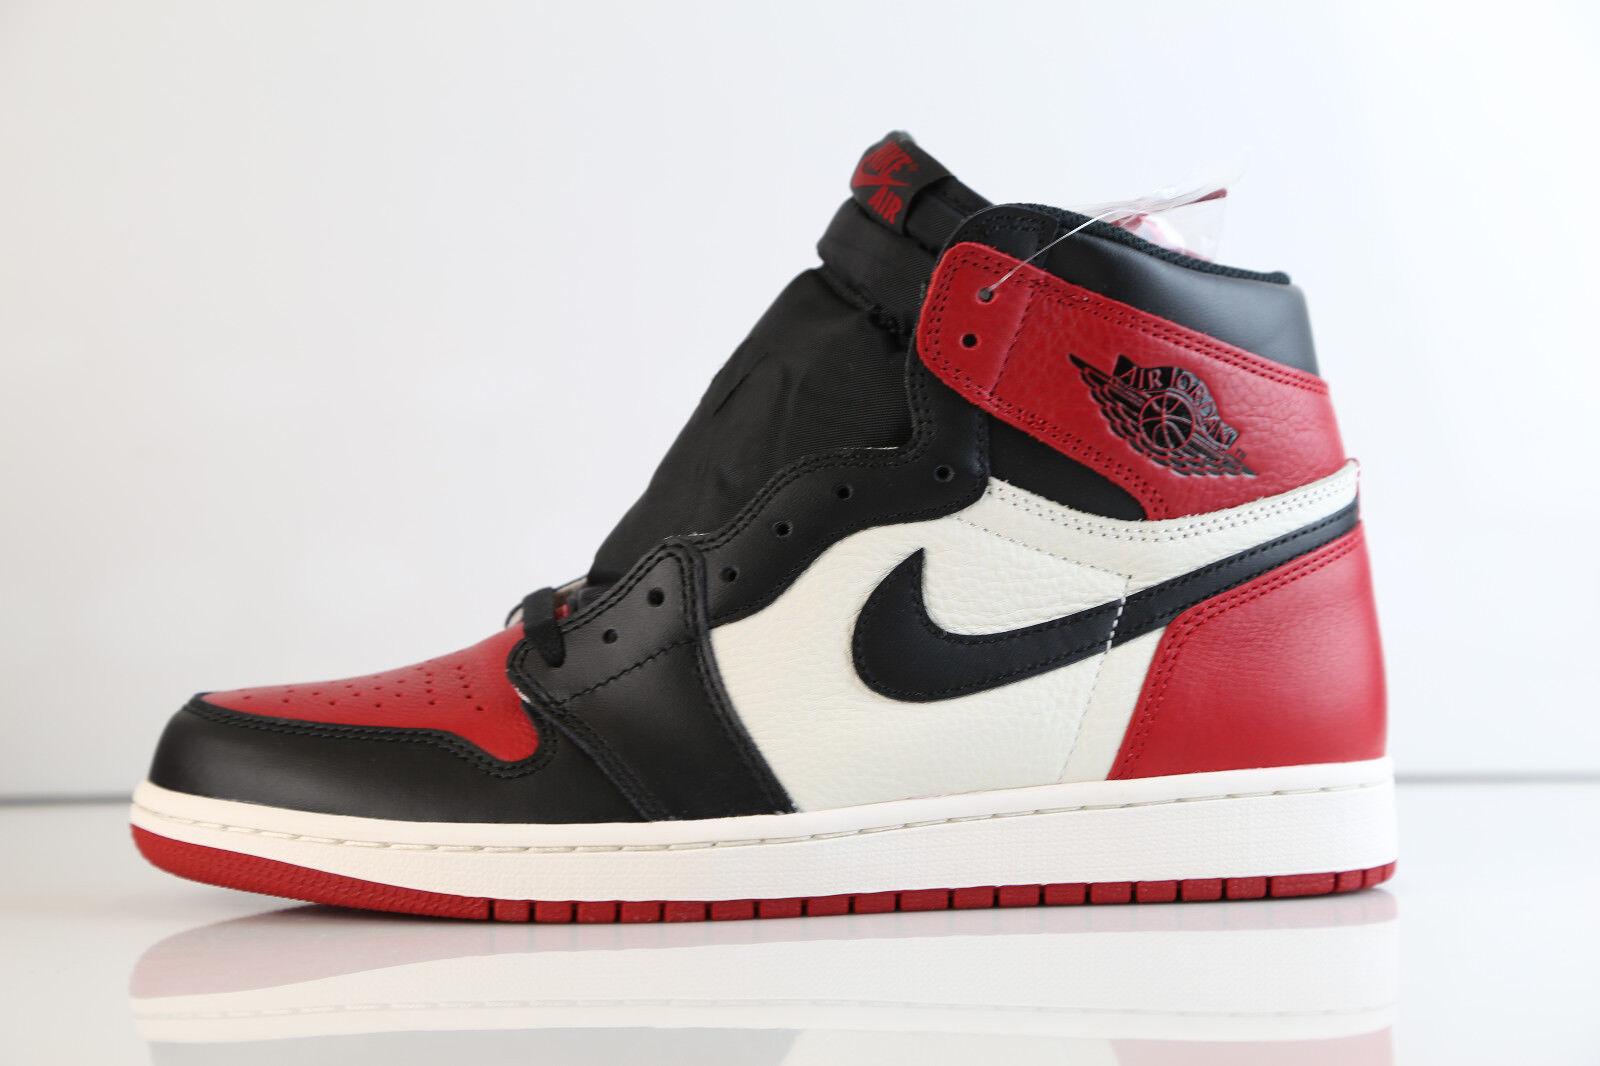 Air Jordan Retro 1 High OG OG OG Brosso Toe nero Summit bianca rosso 555088-610 8-12 8916e0